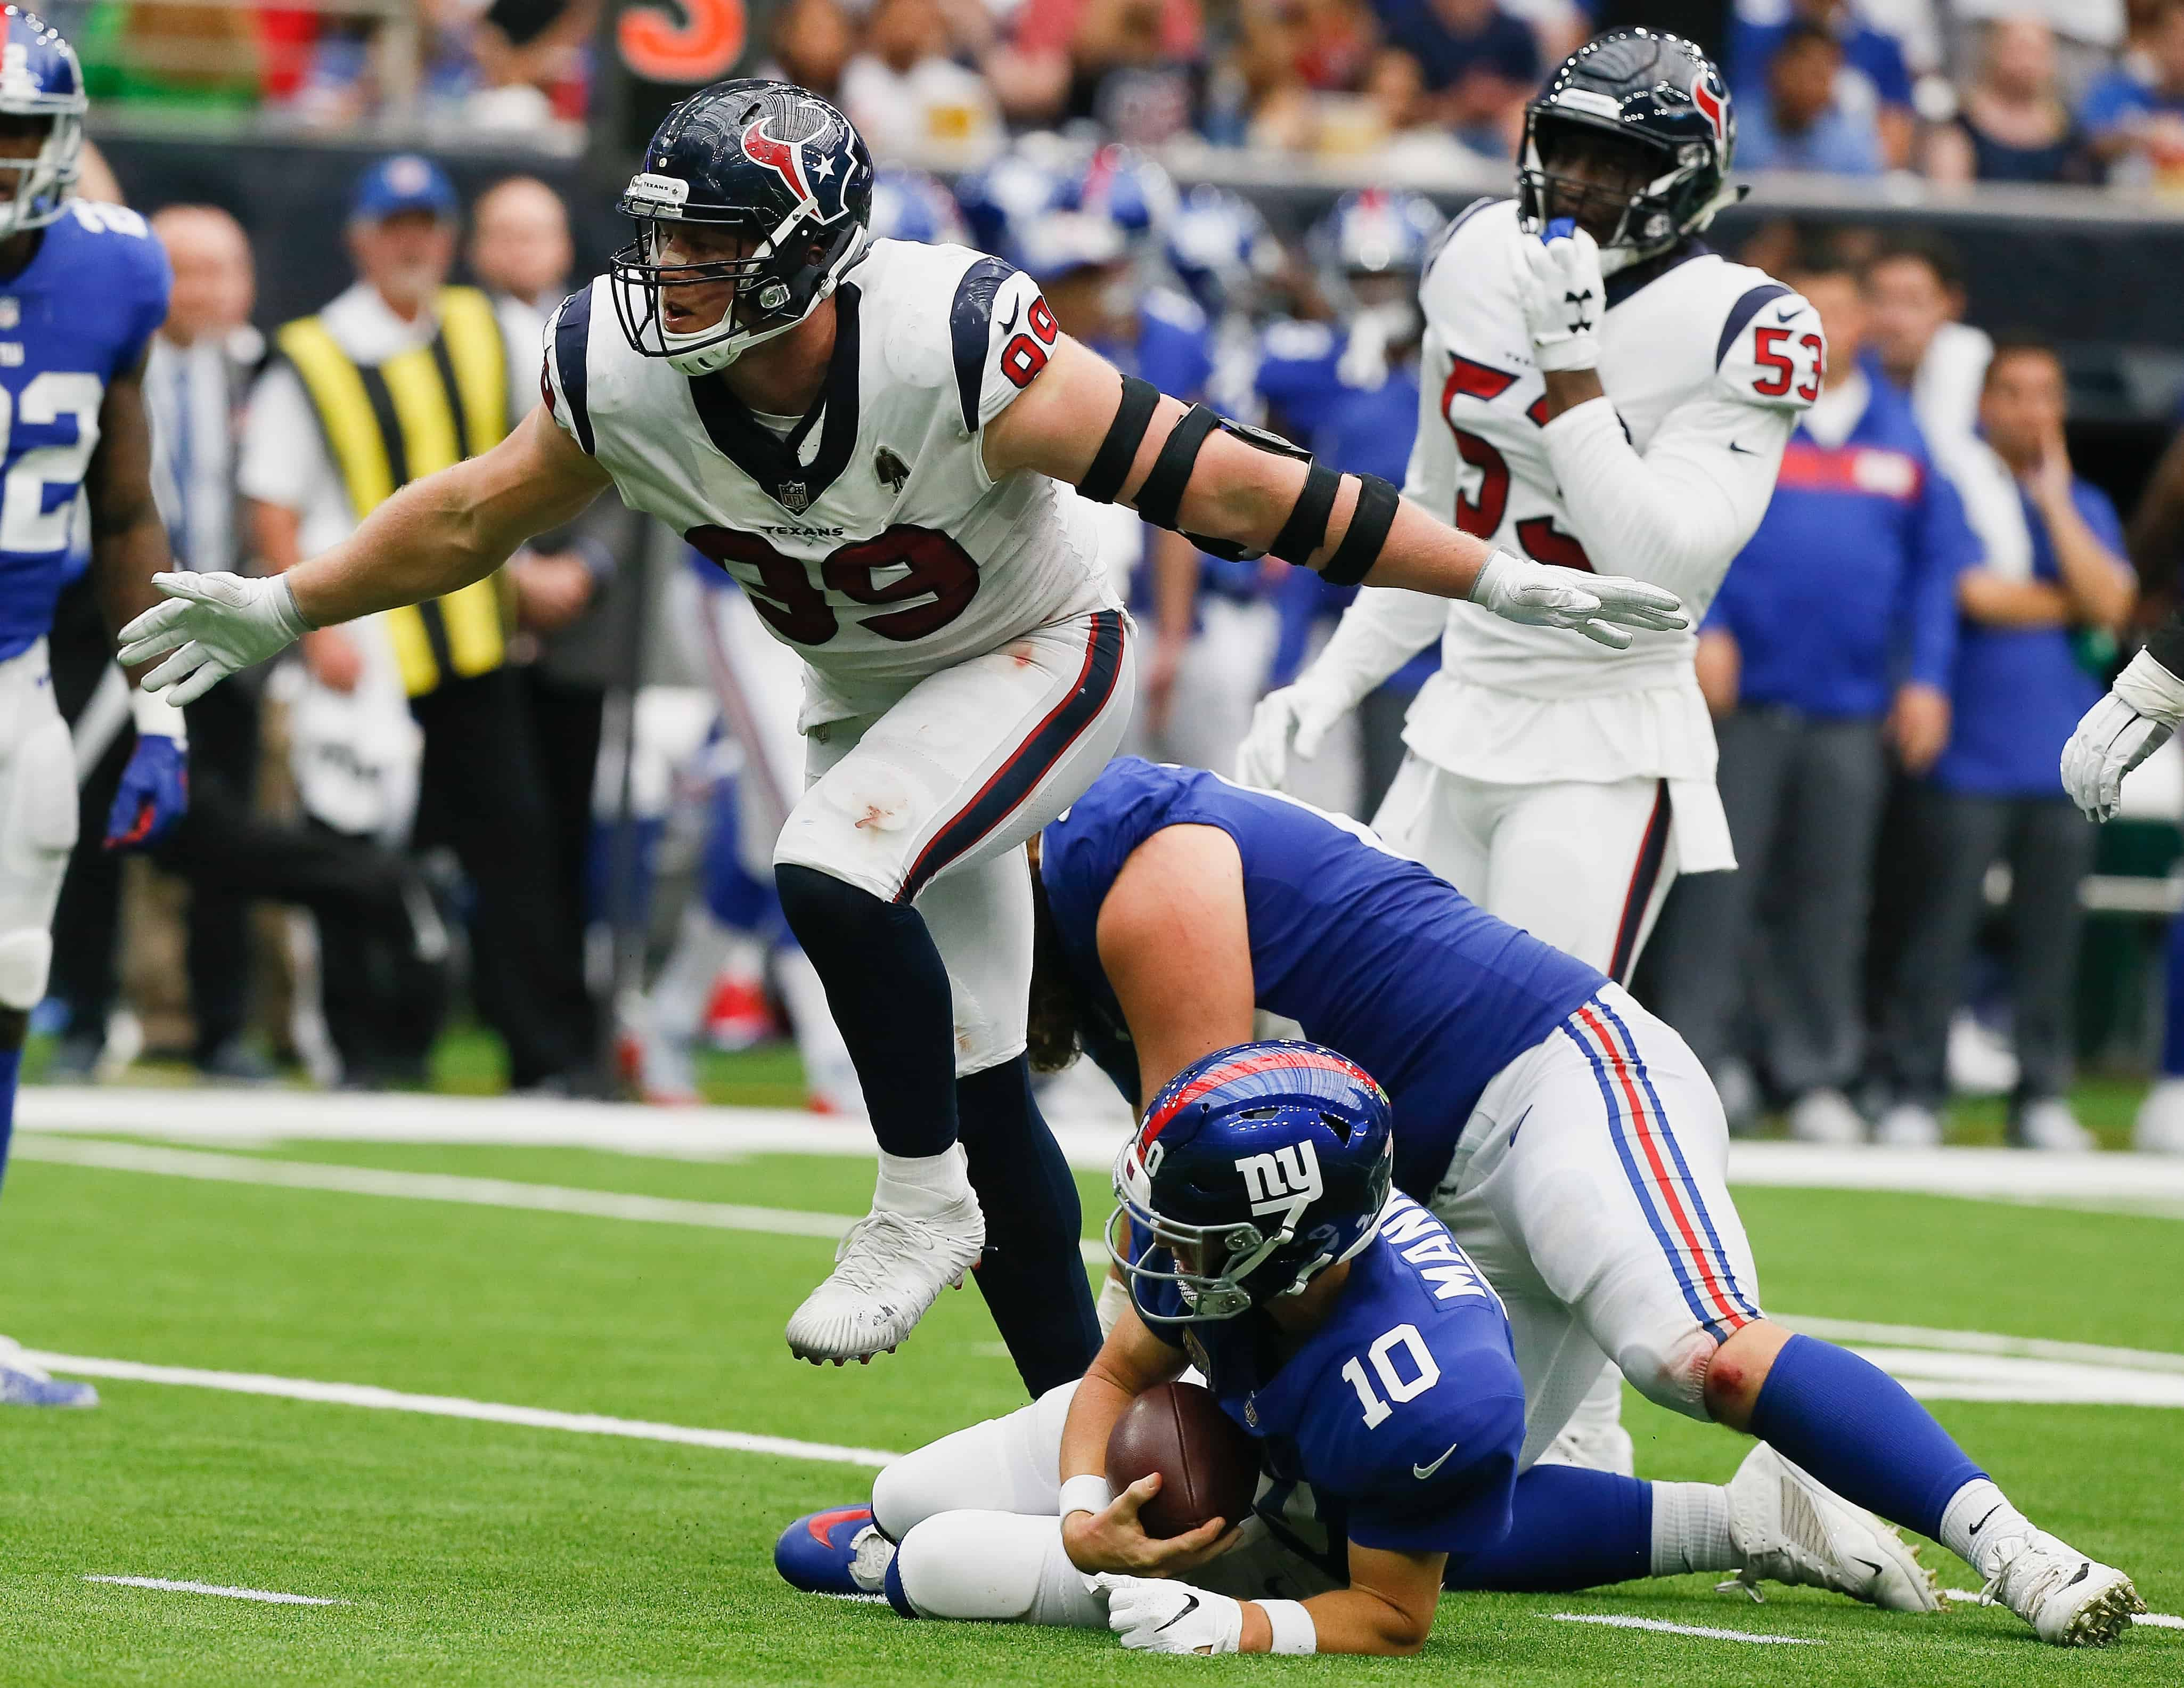 JJ Watt sacks Eli Manning